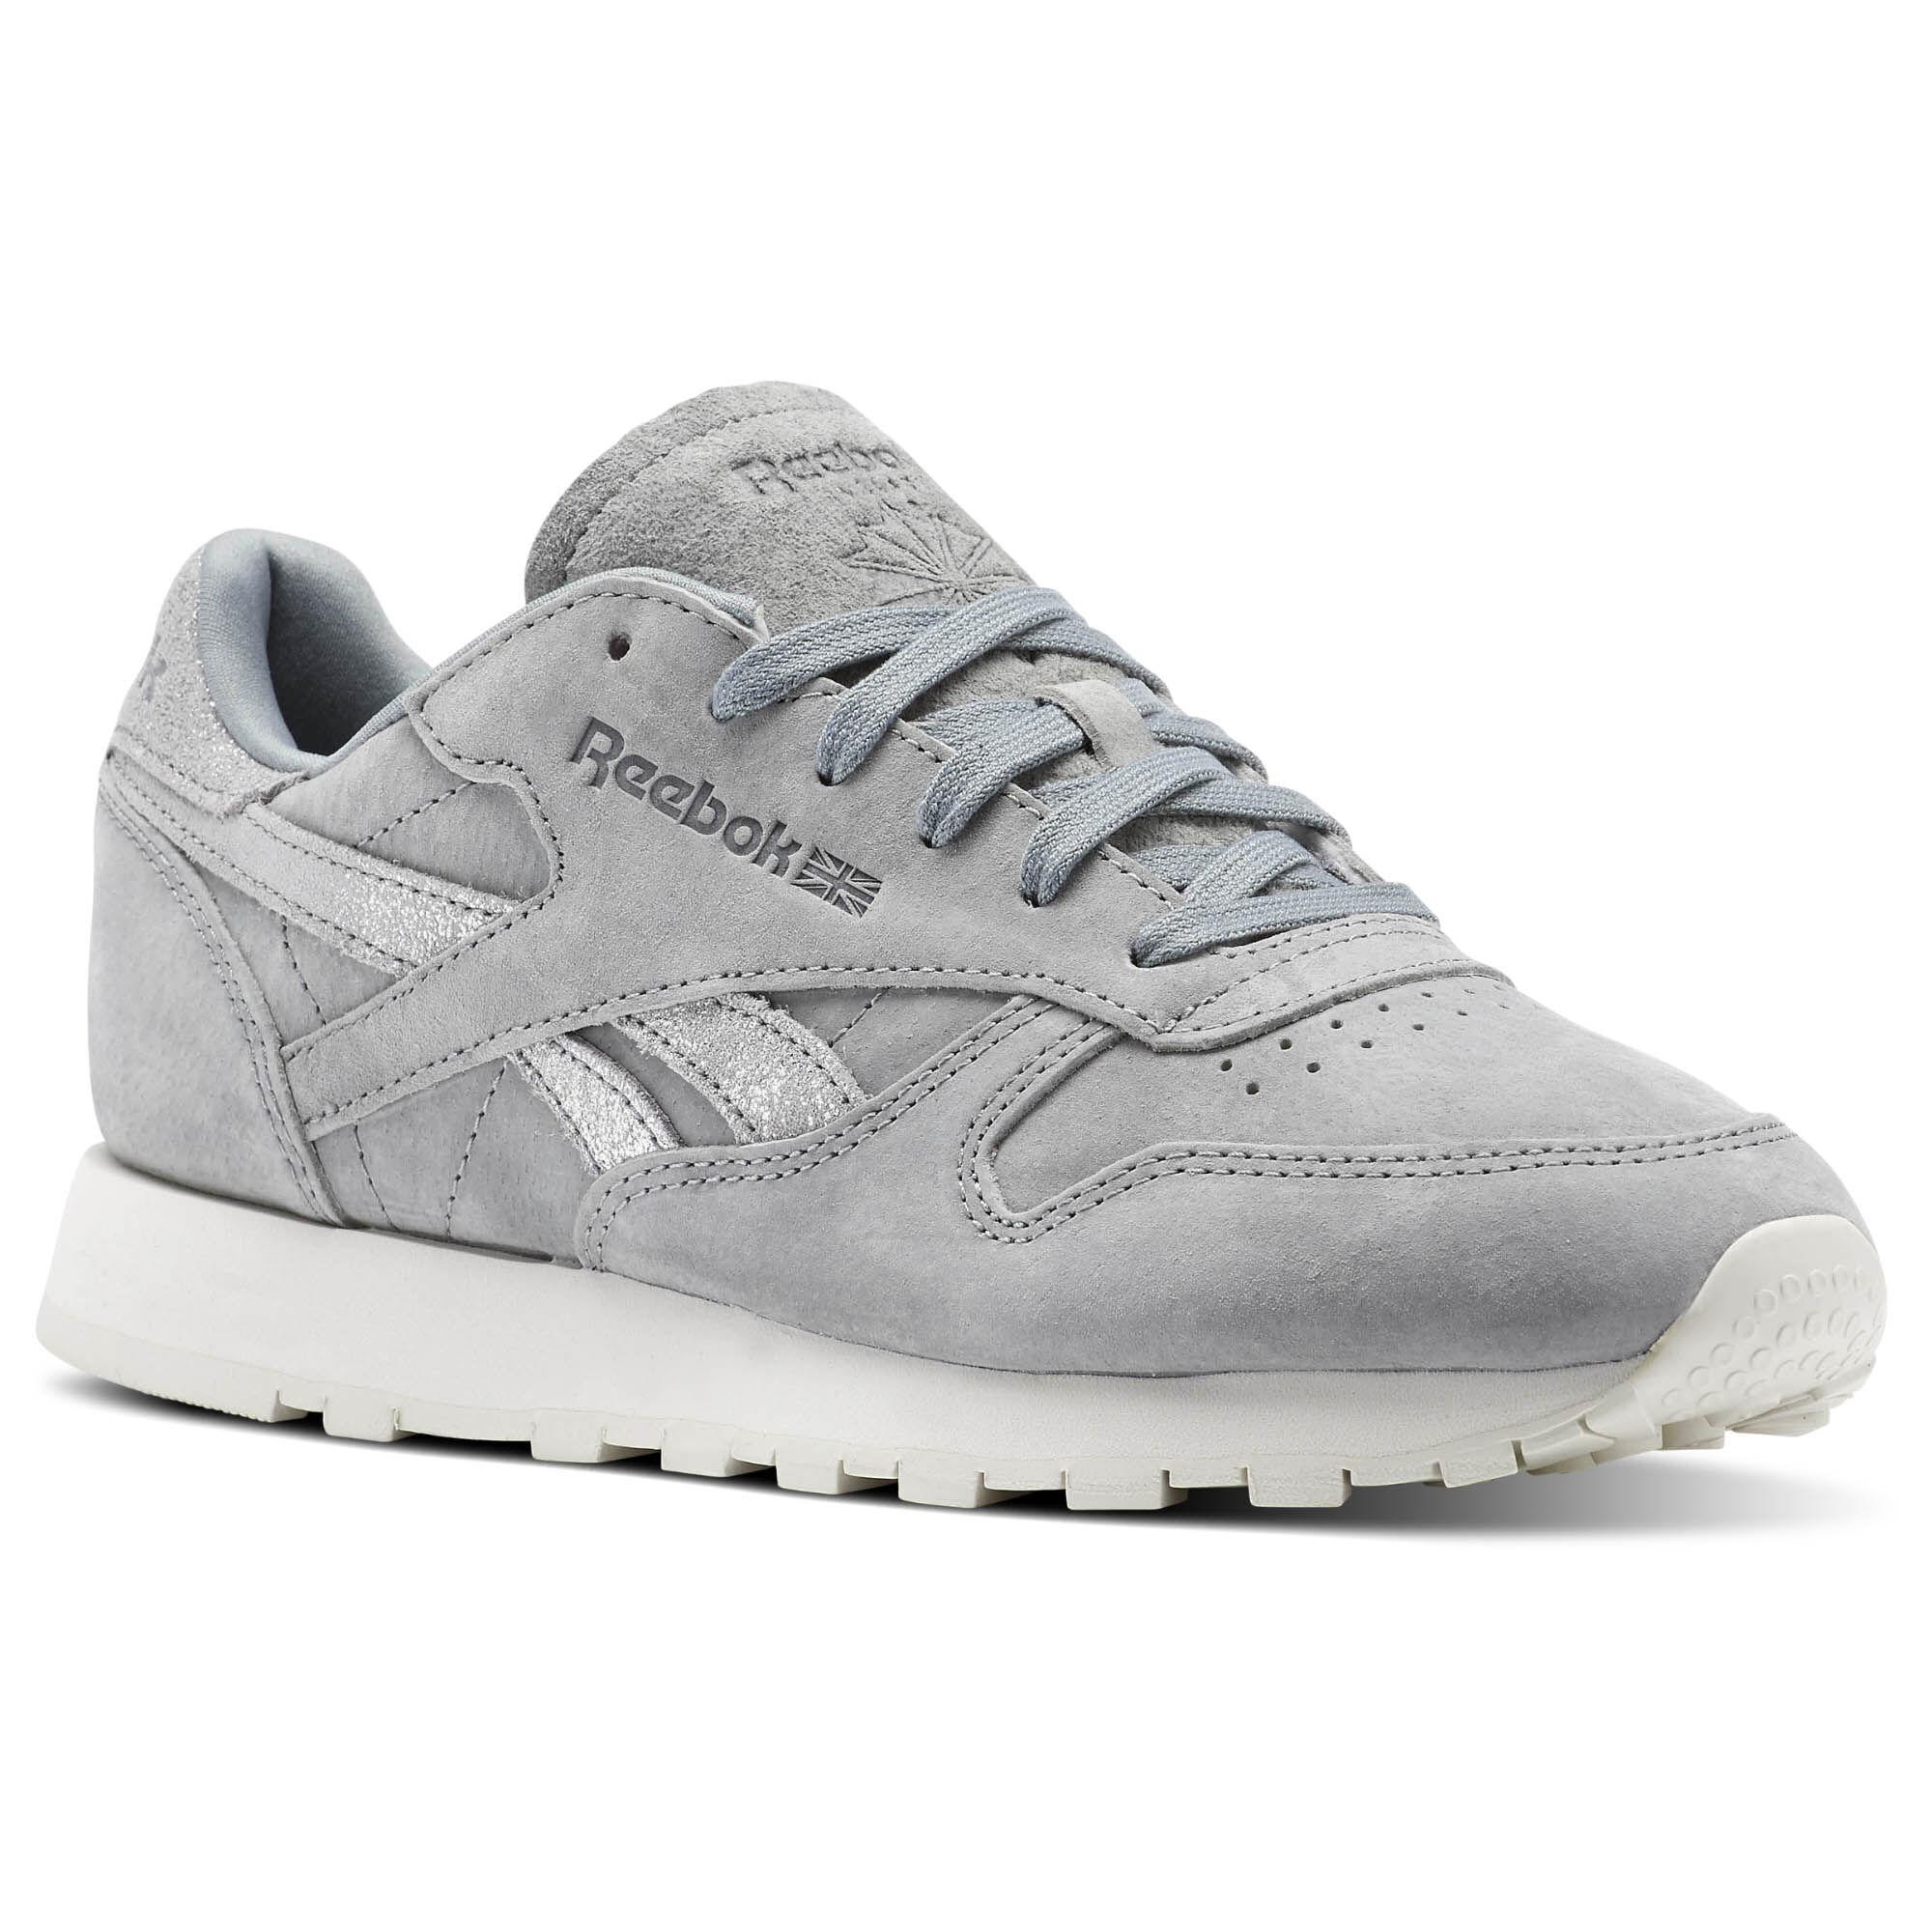 Reebok Classic Leather Shimmer Flint Grey Matte Silver Chalk Bs